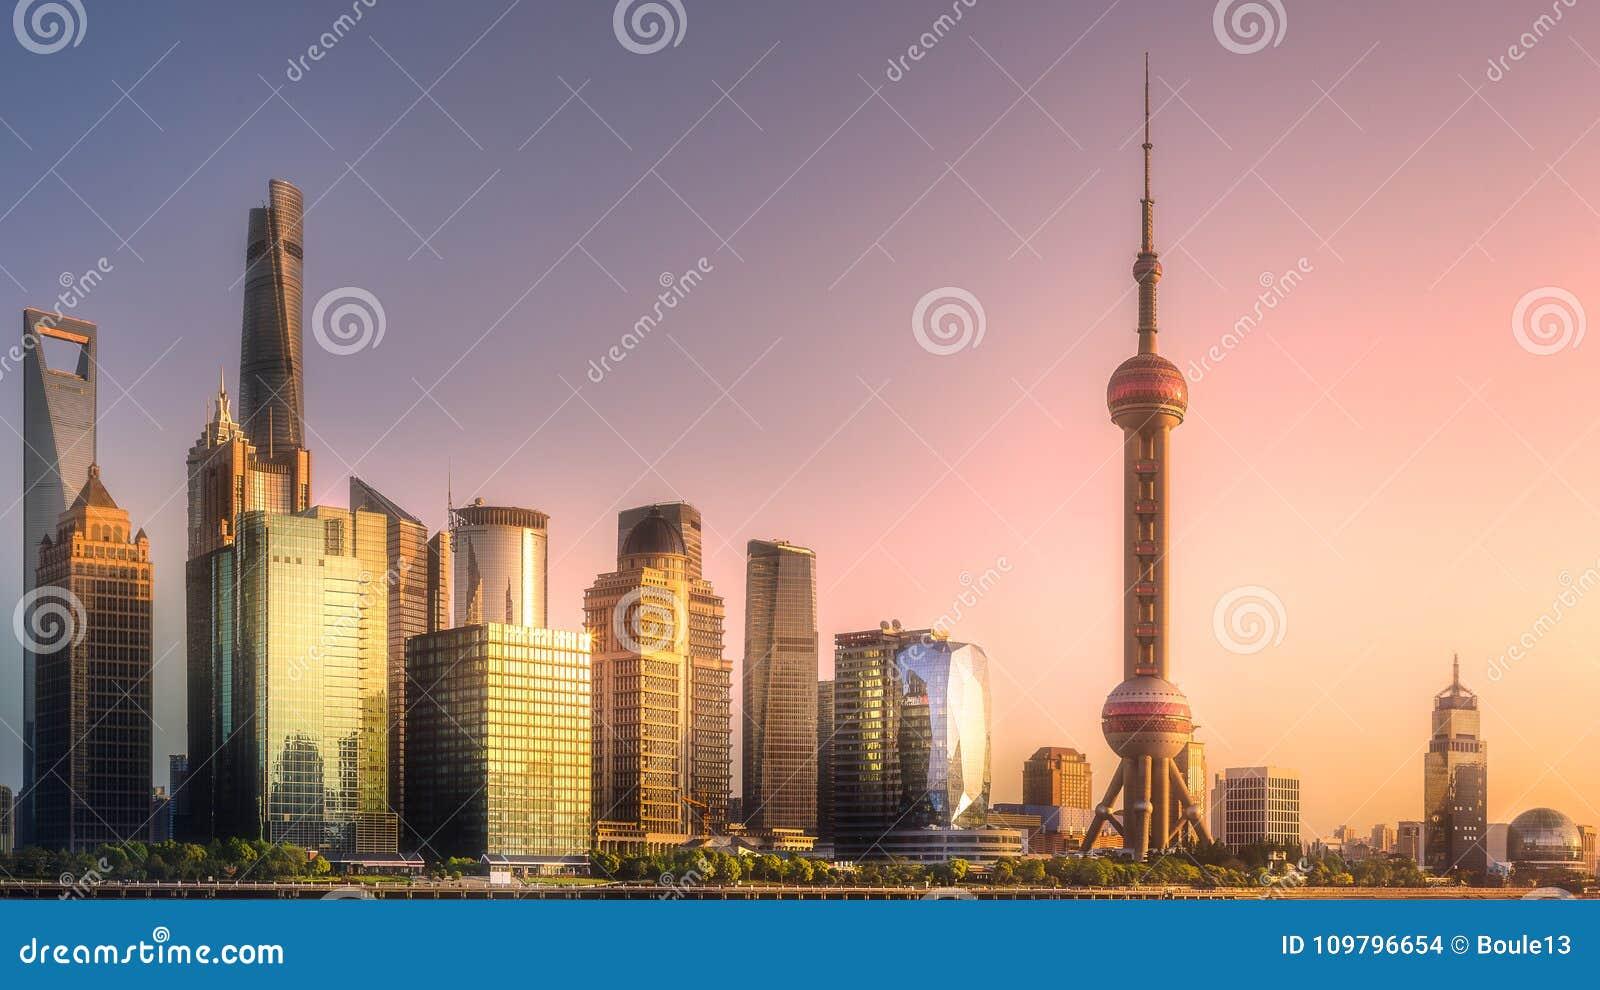 Night view of Shanghai skyline and Huangpu river